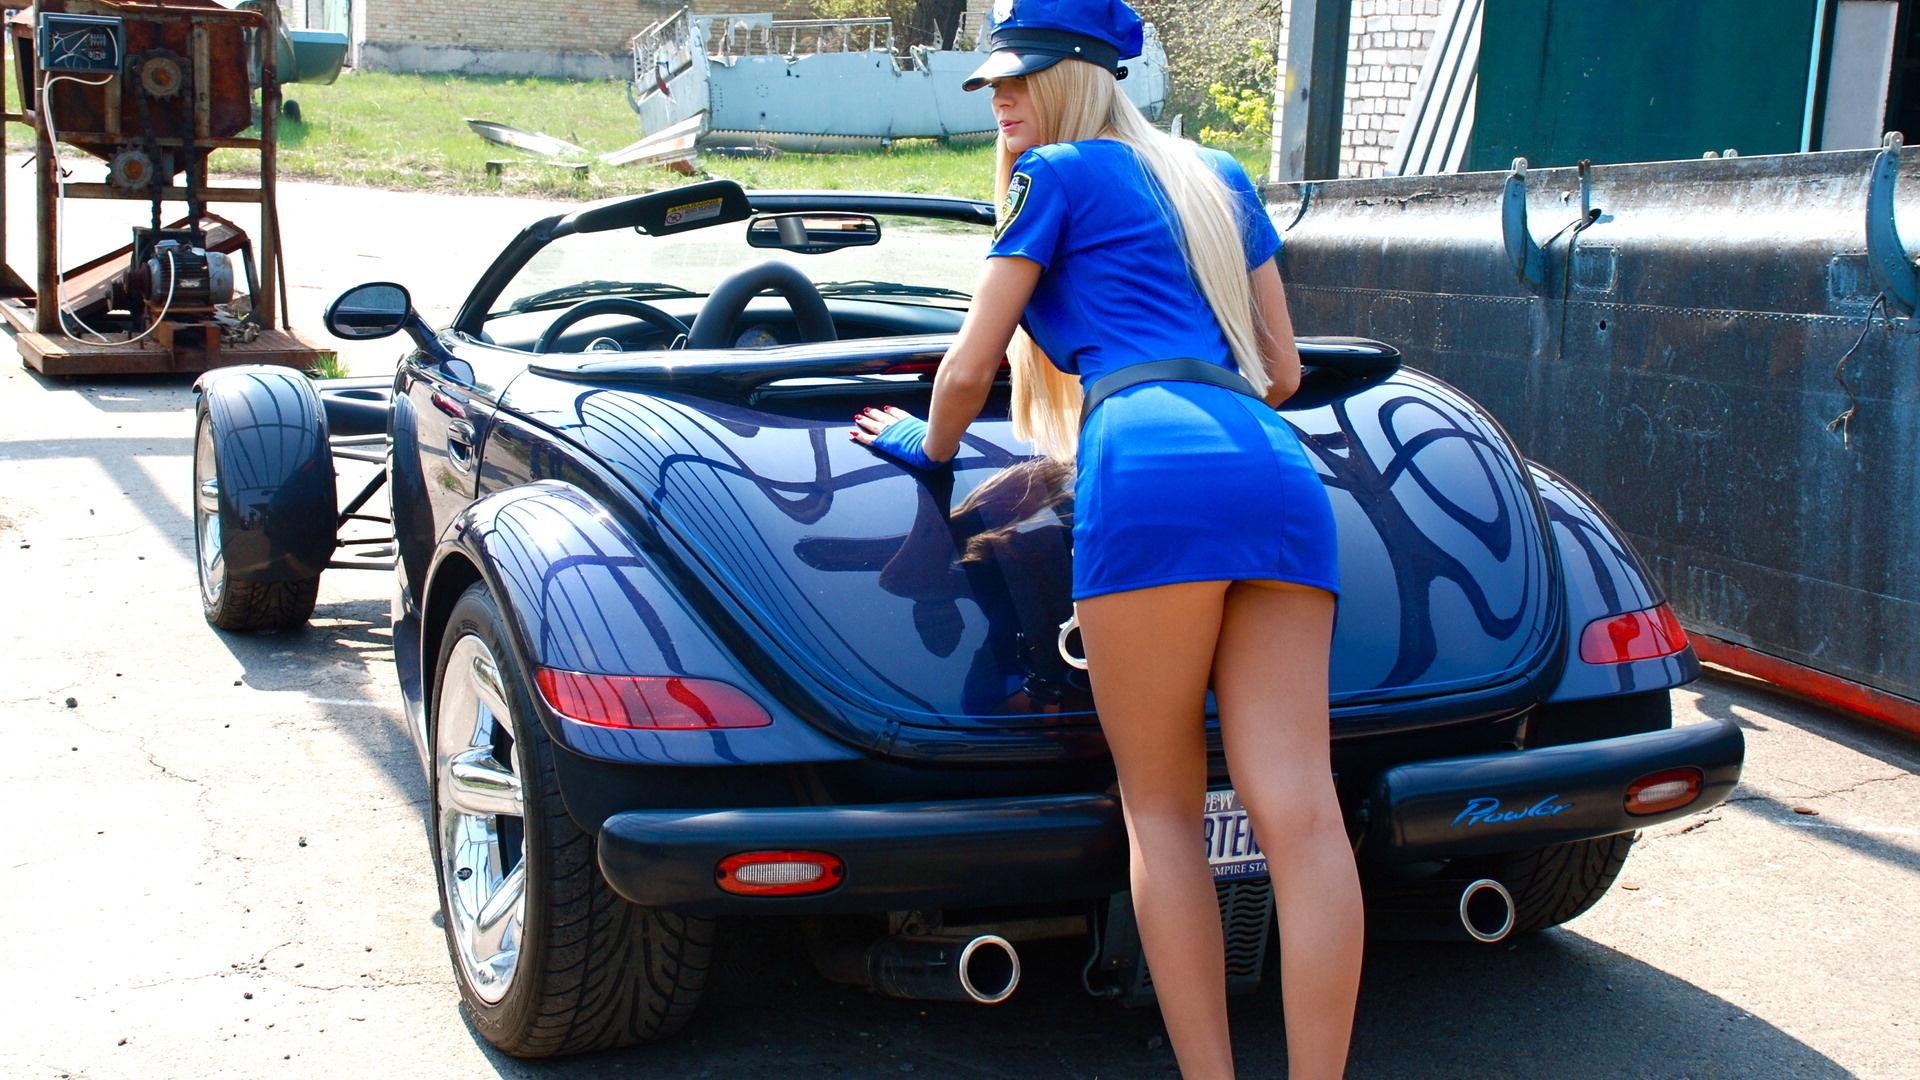 Wallpaper car girl tuning speed sport car plymouth prowler 1920x1080